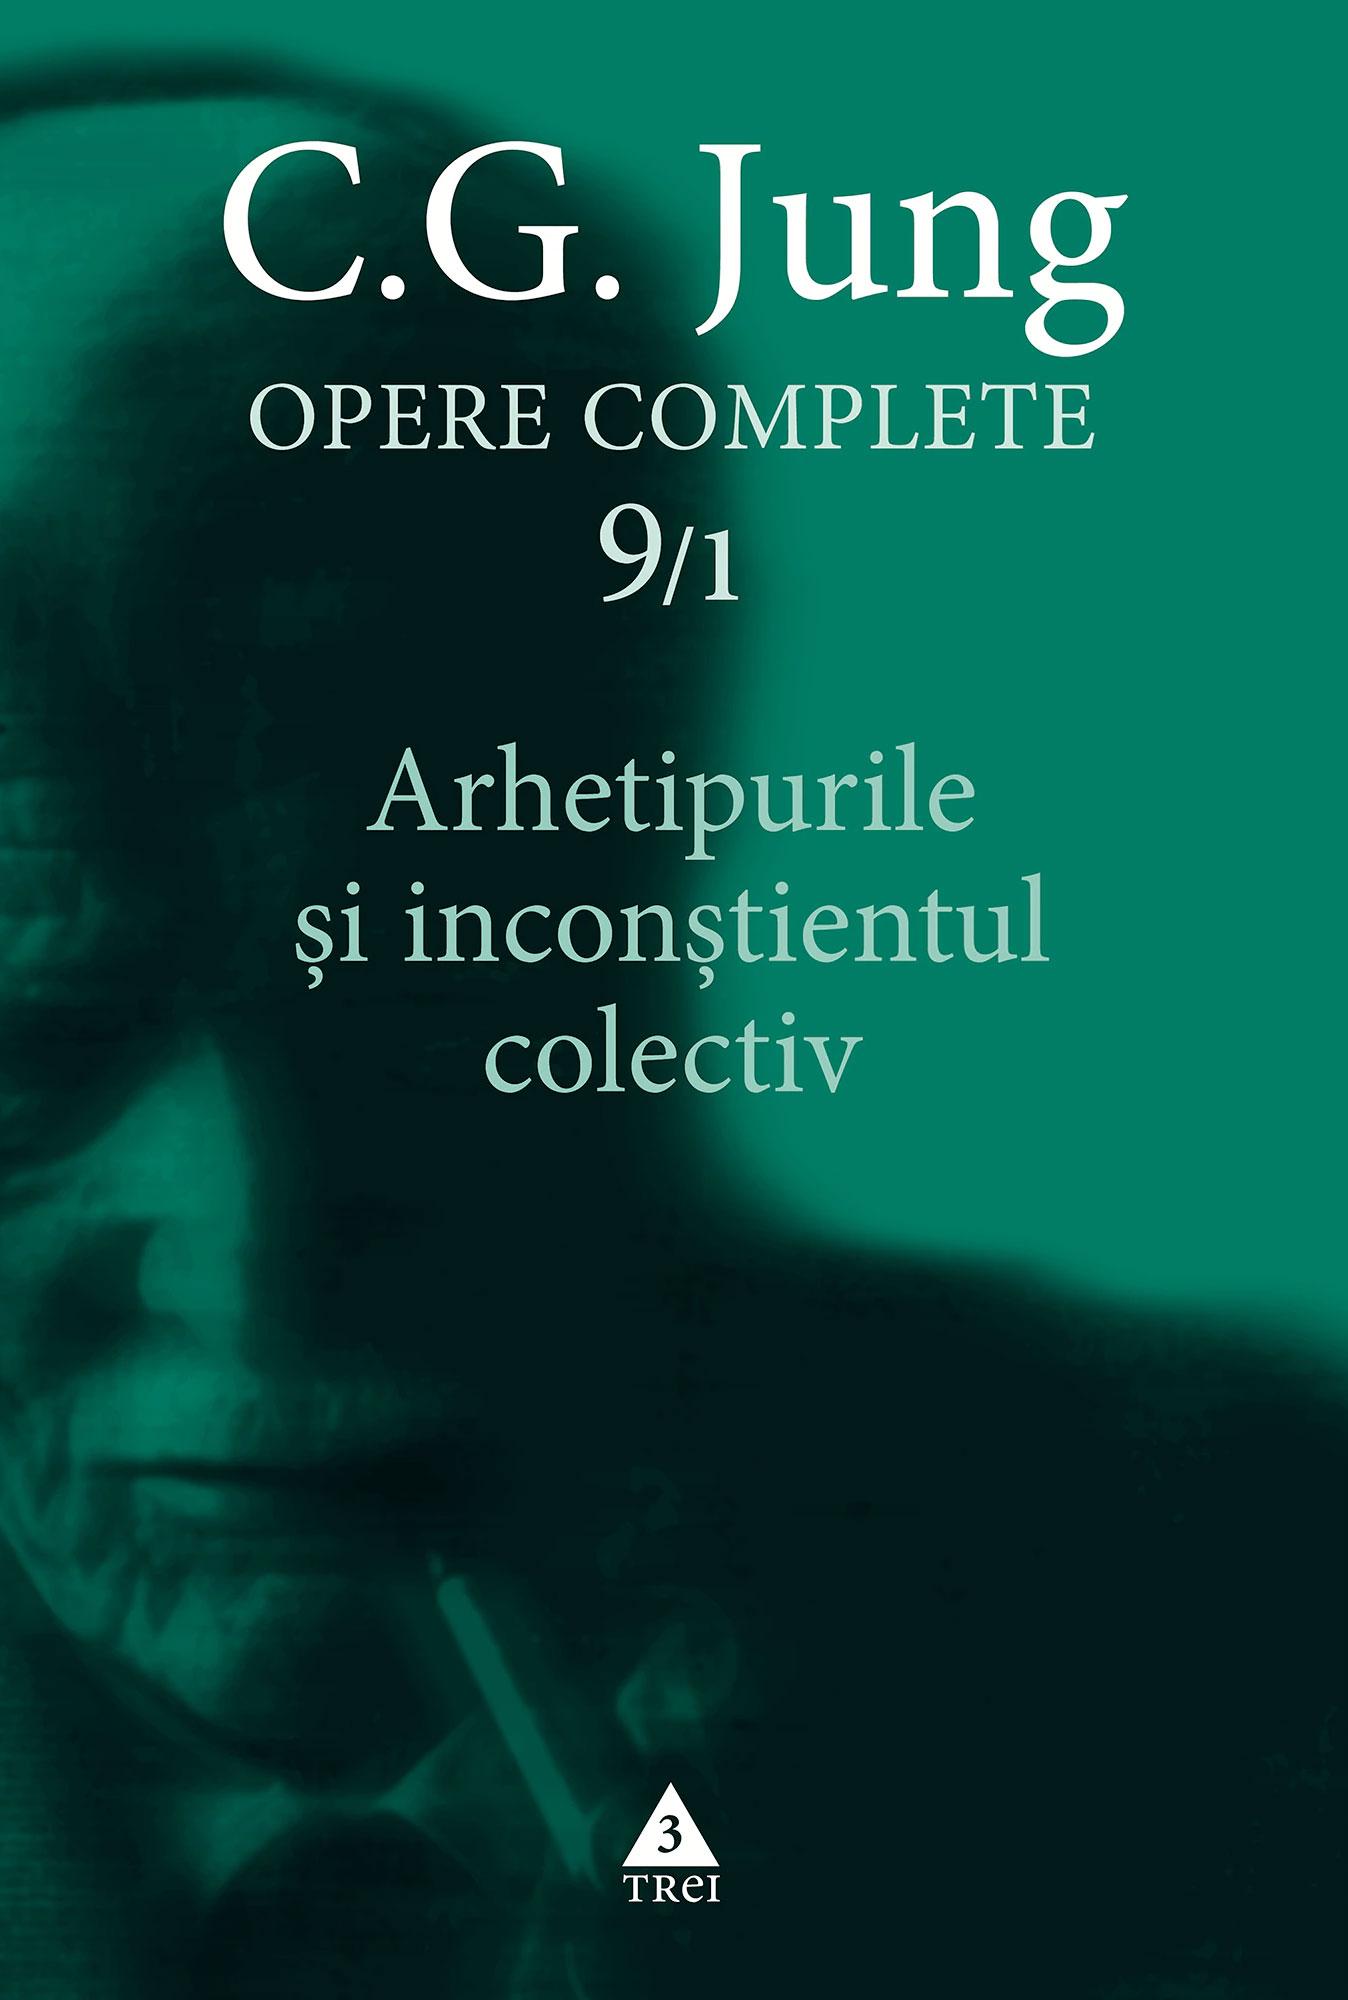 C.G. JUNG - OPERE COMPLETE 9/ 1 - Arhetipurile si inconstientul colectiv